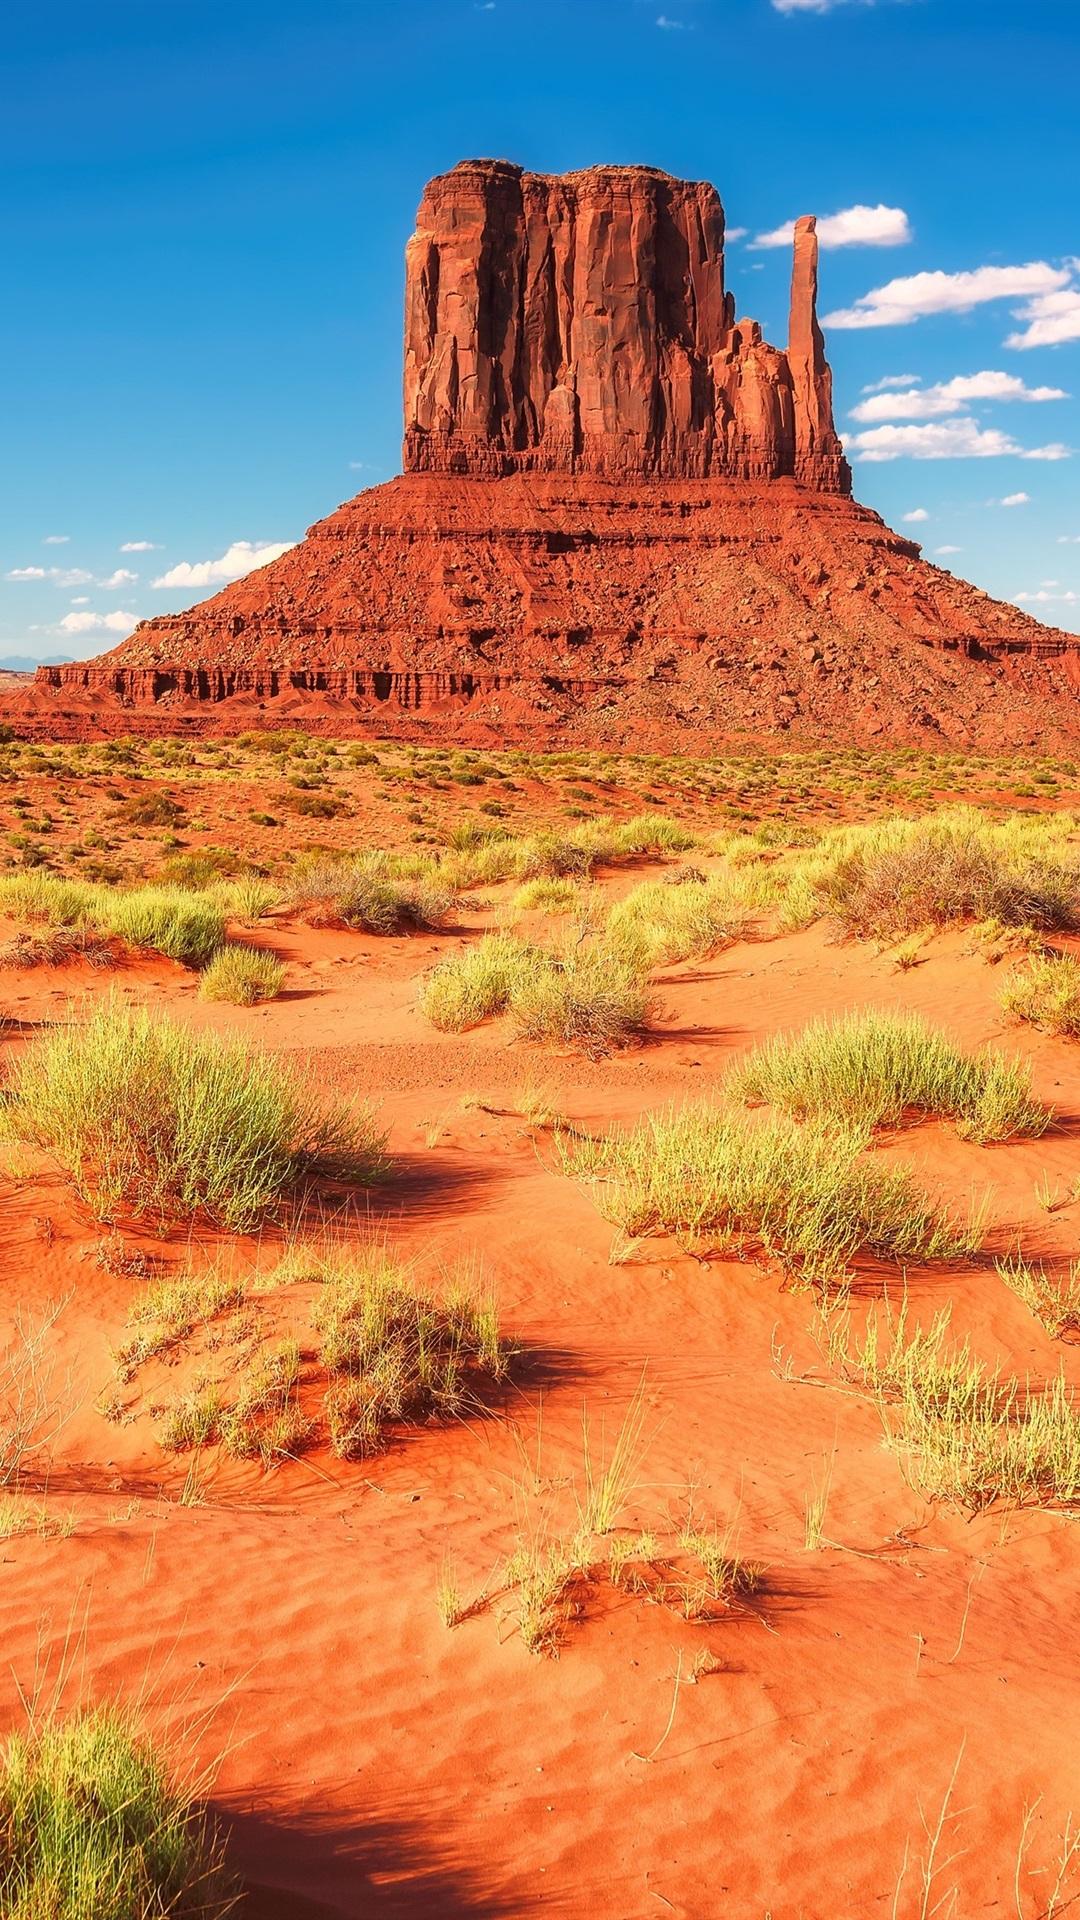 Wallpaper Desert Rocks Mountains Grass Usa Arizona